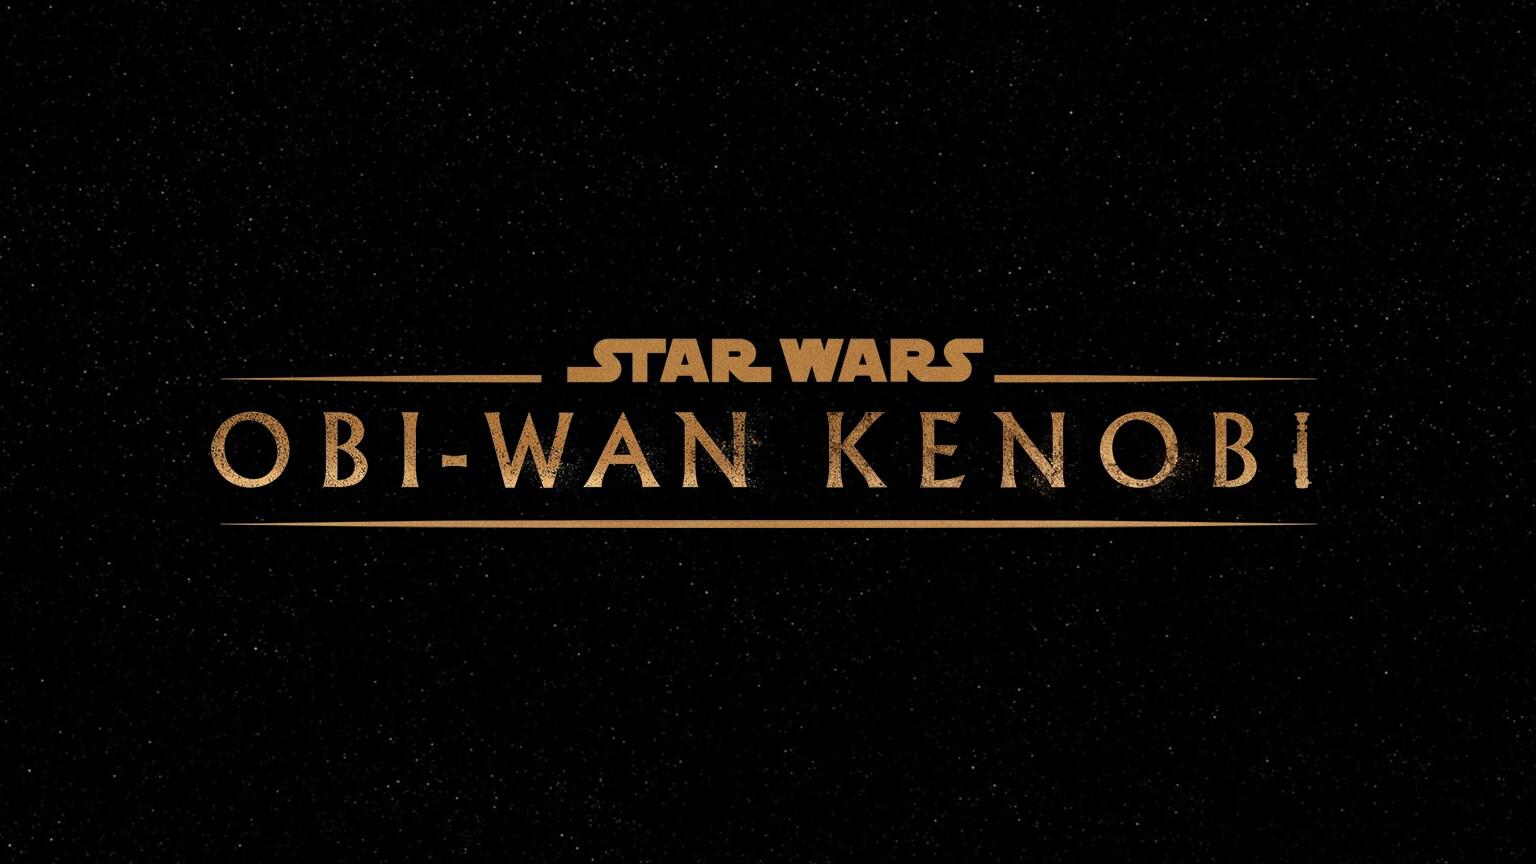 Obi-Wan Kenobi Series to Begin Production in April, Cast Revealed